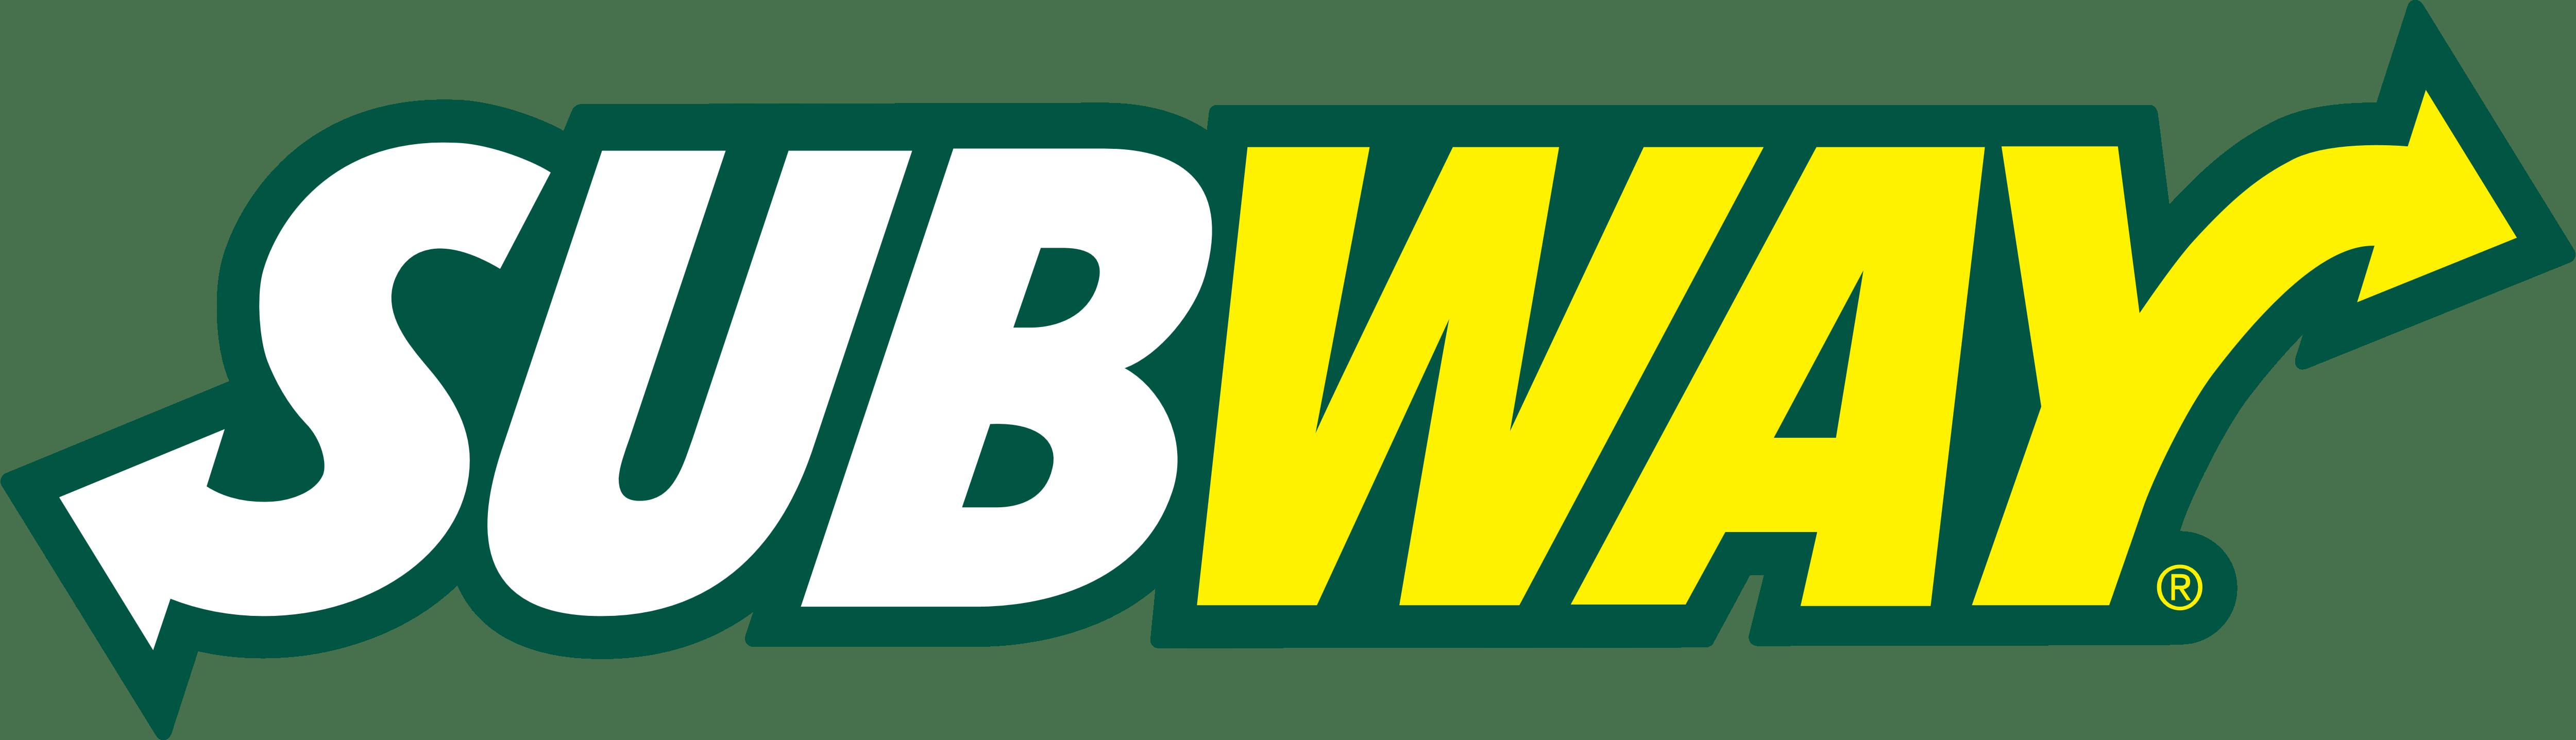 image free Subway clipart logo. Transparent png stickpng